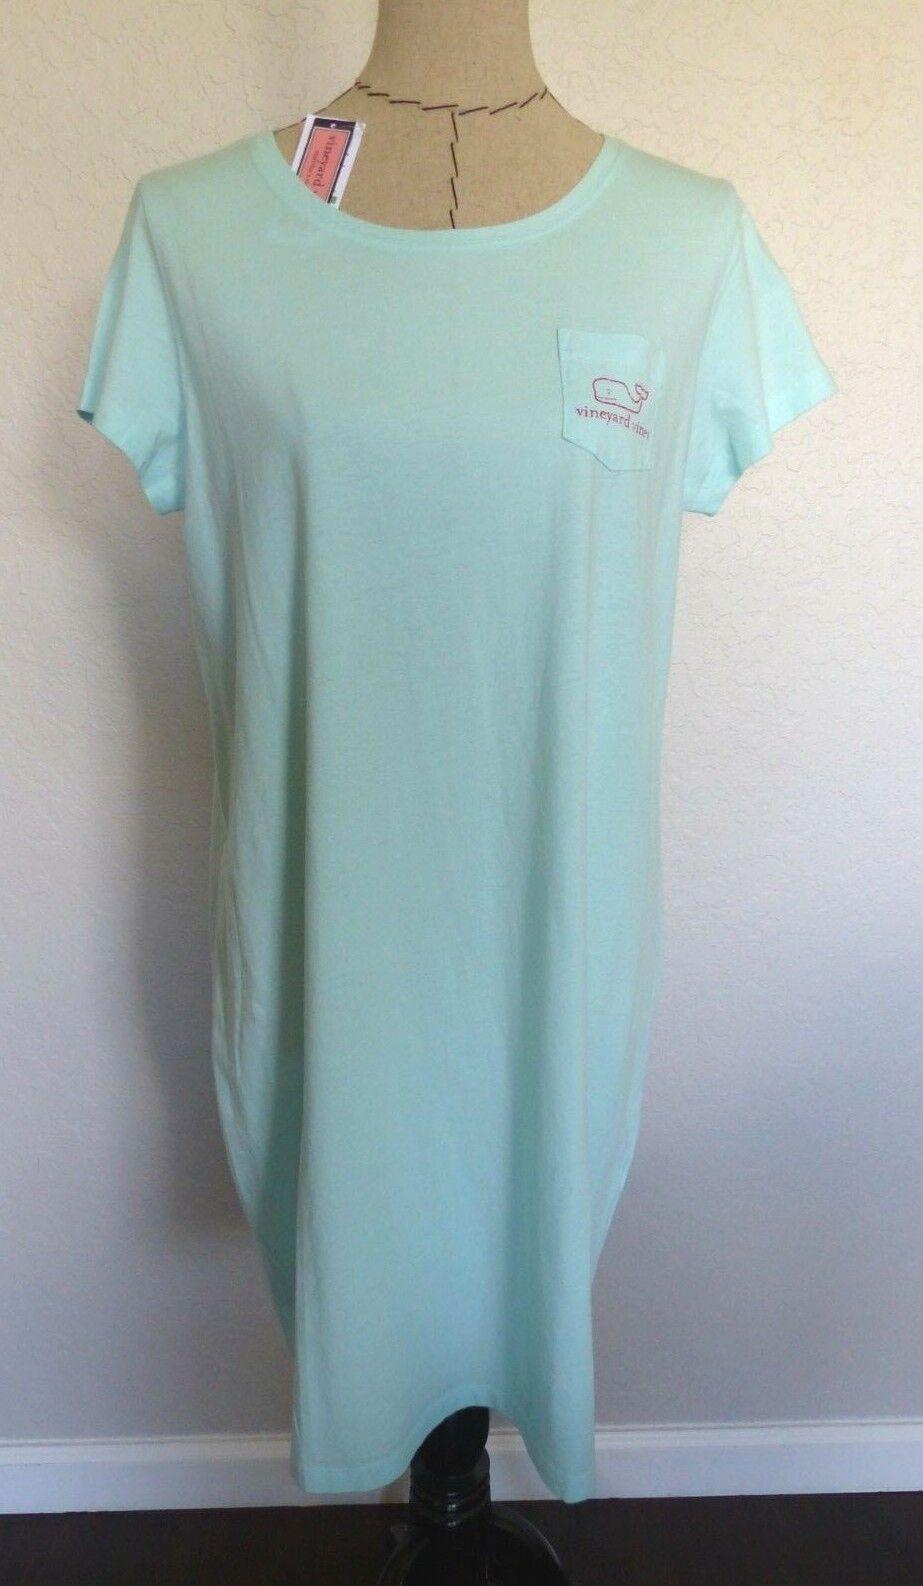 VINEYARD VINES Woherren Short Sleeve Graphic Tee Shirt Dress CRYSTAL Blau LG NWT